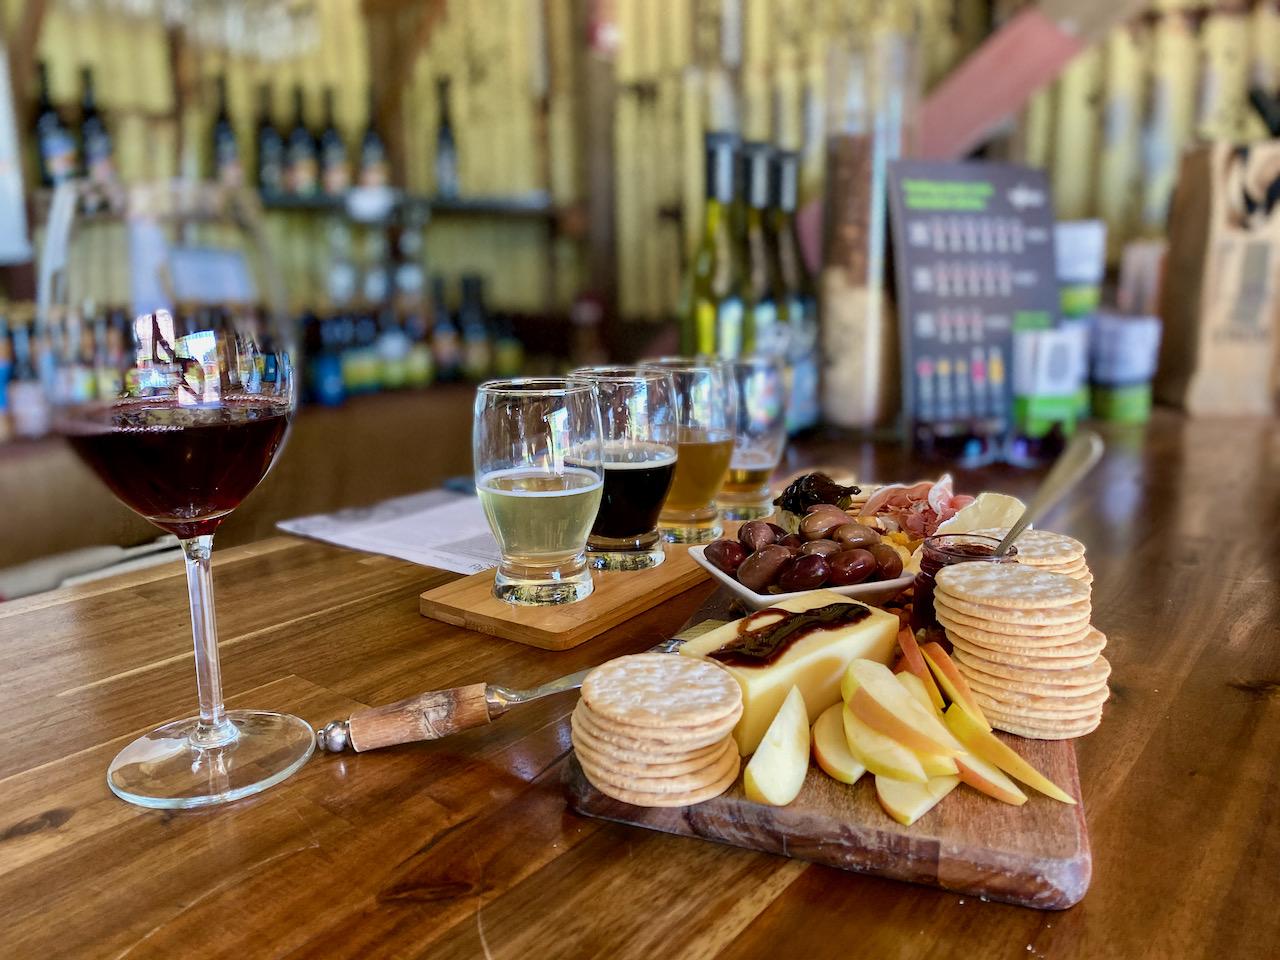 Wine&Beer Tasting in Wannon, Victoria, Australien (24.10.2019)